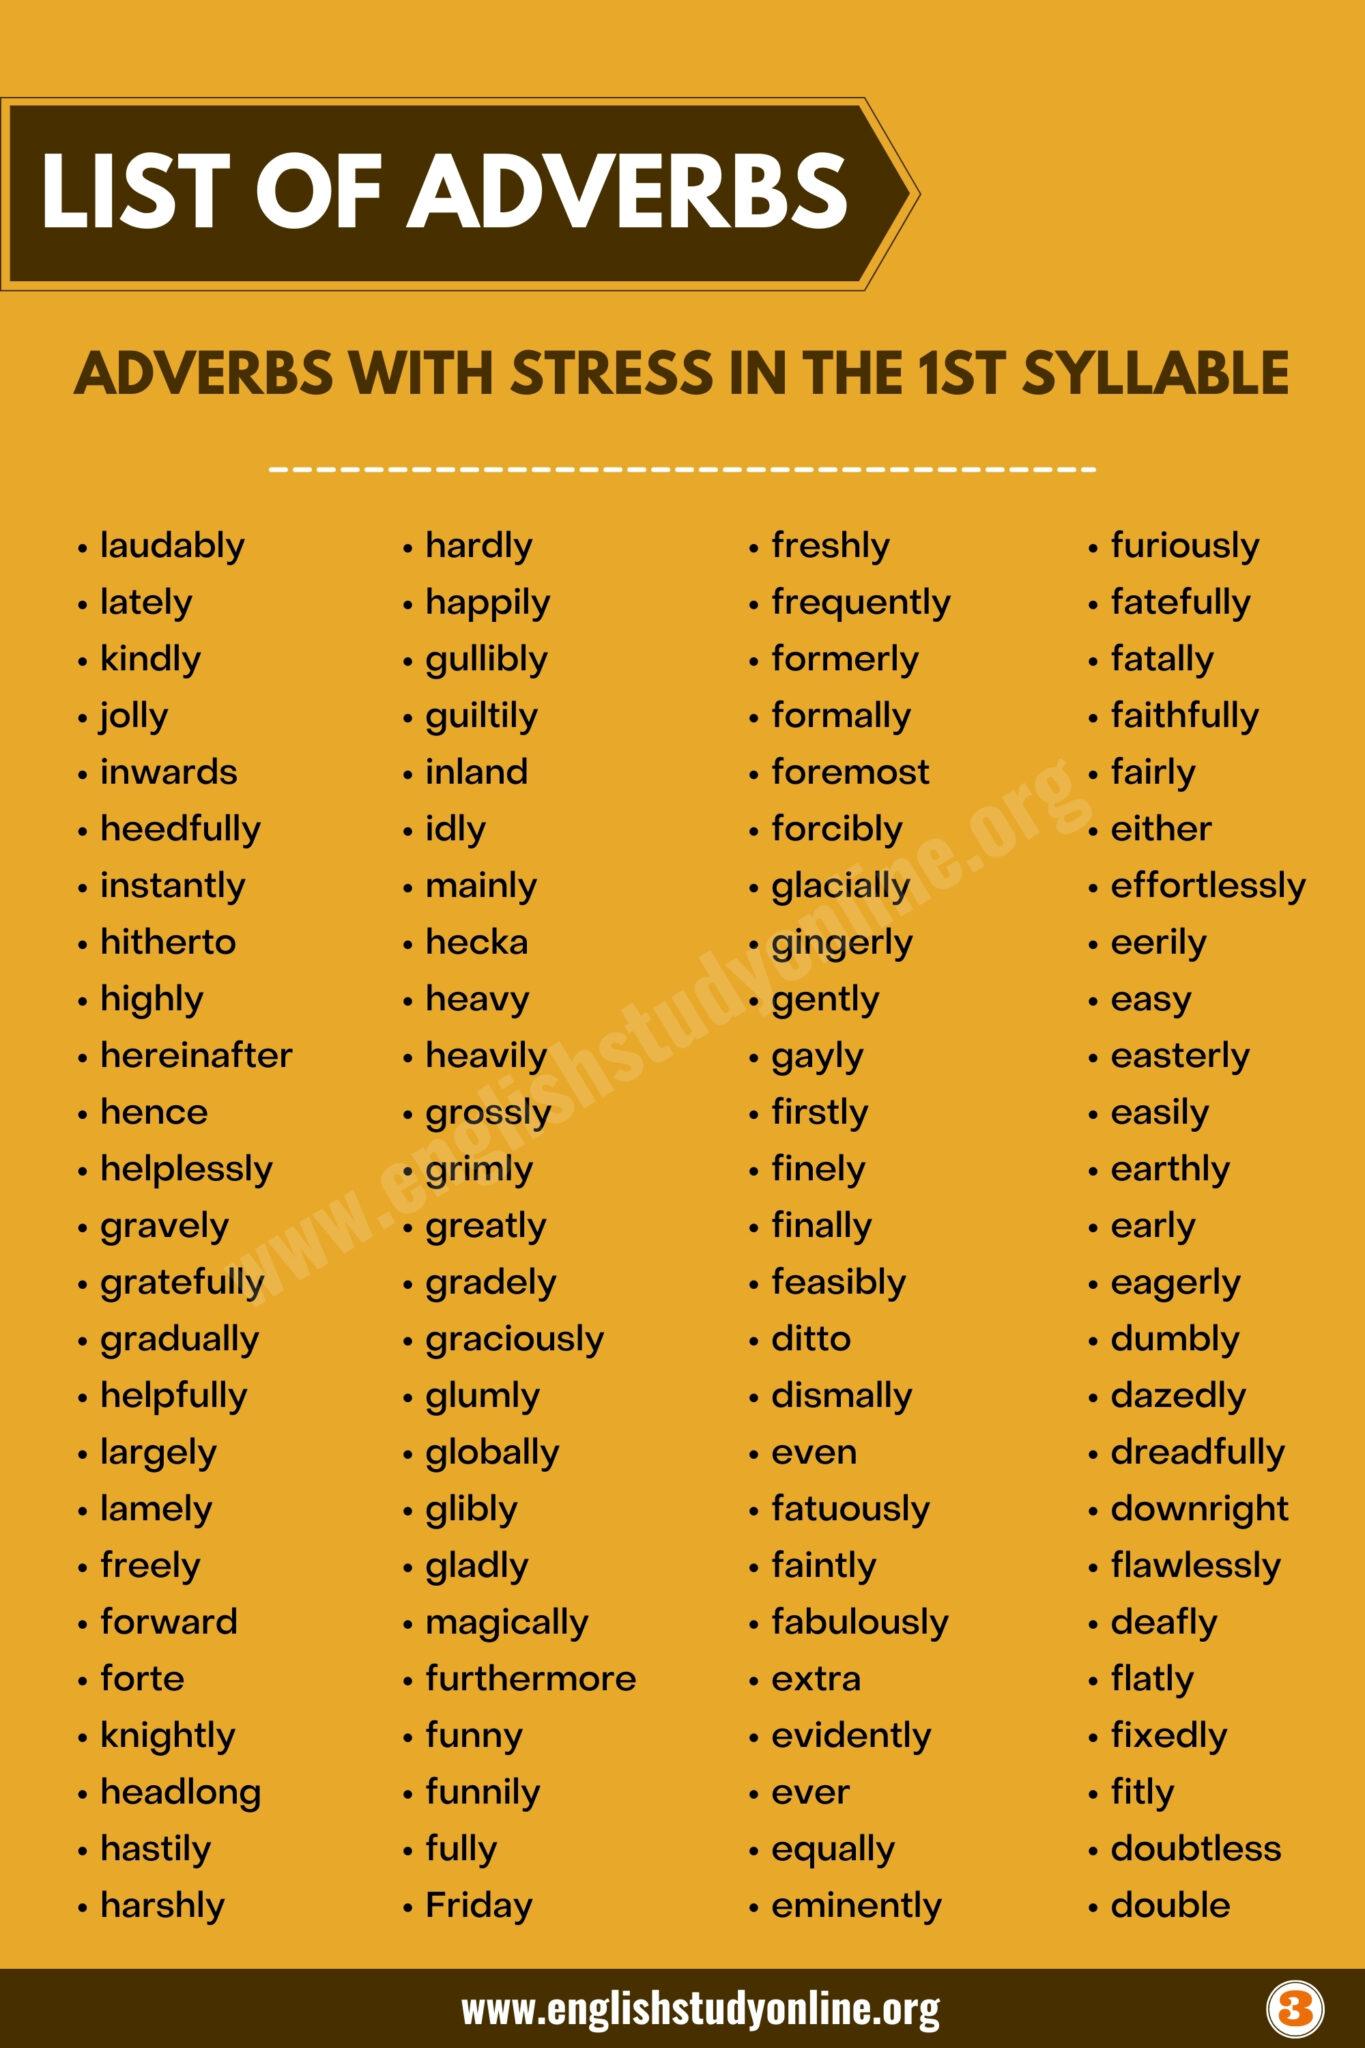 List of Adverbs